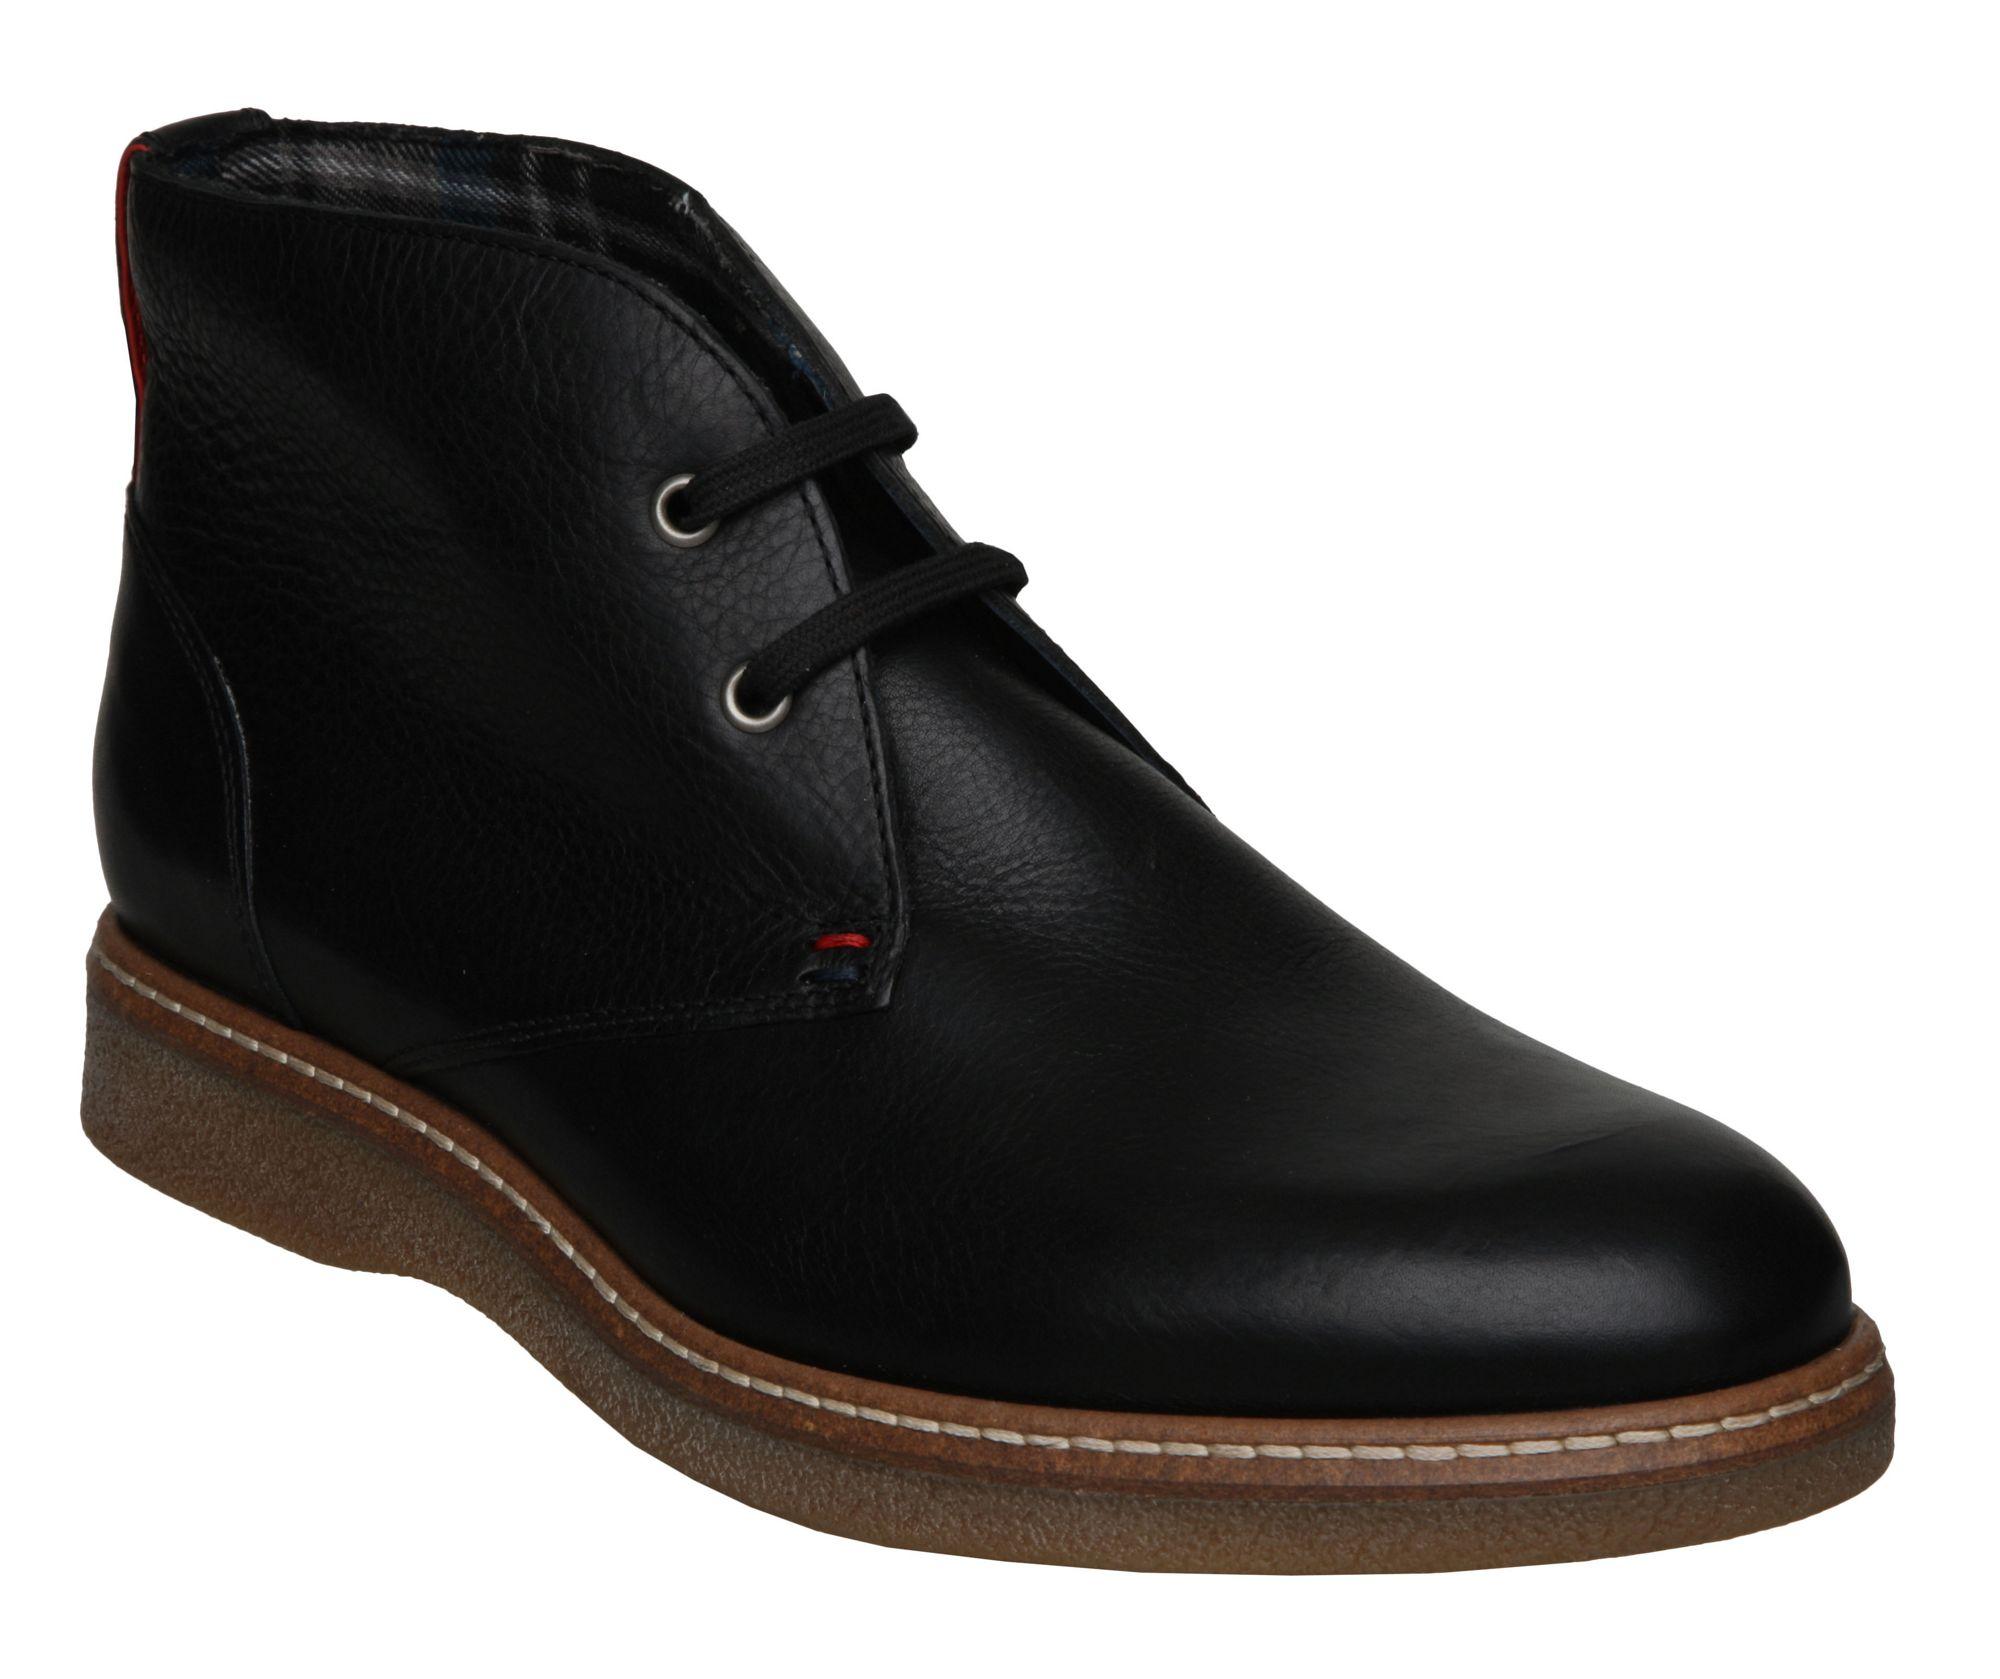 tommy hilfiger christopher 1a casual boots in black for. Black Bedroom Furniture Sets. Home Design Ideas